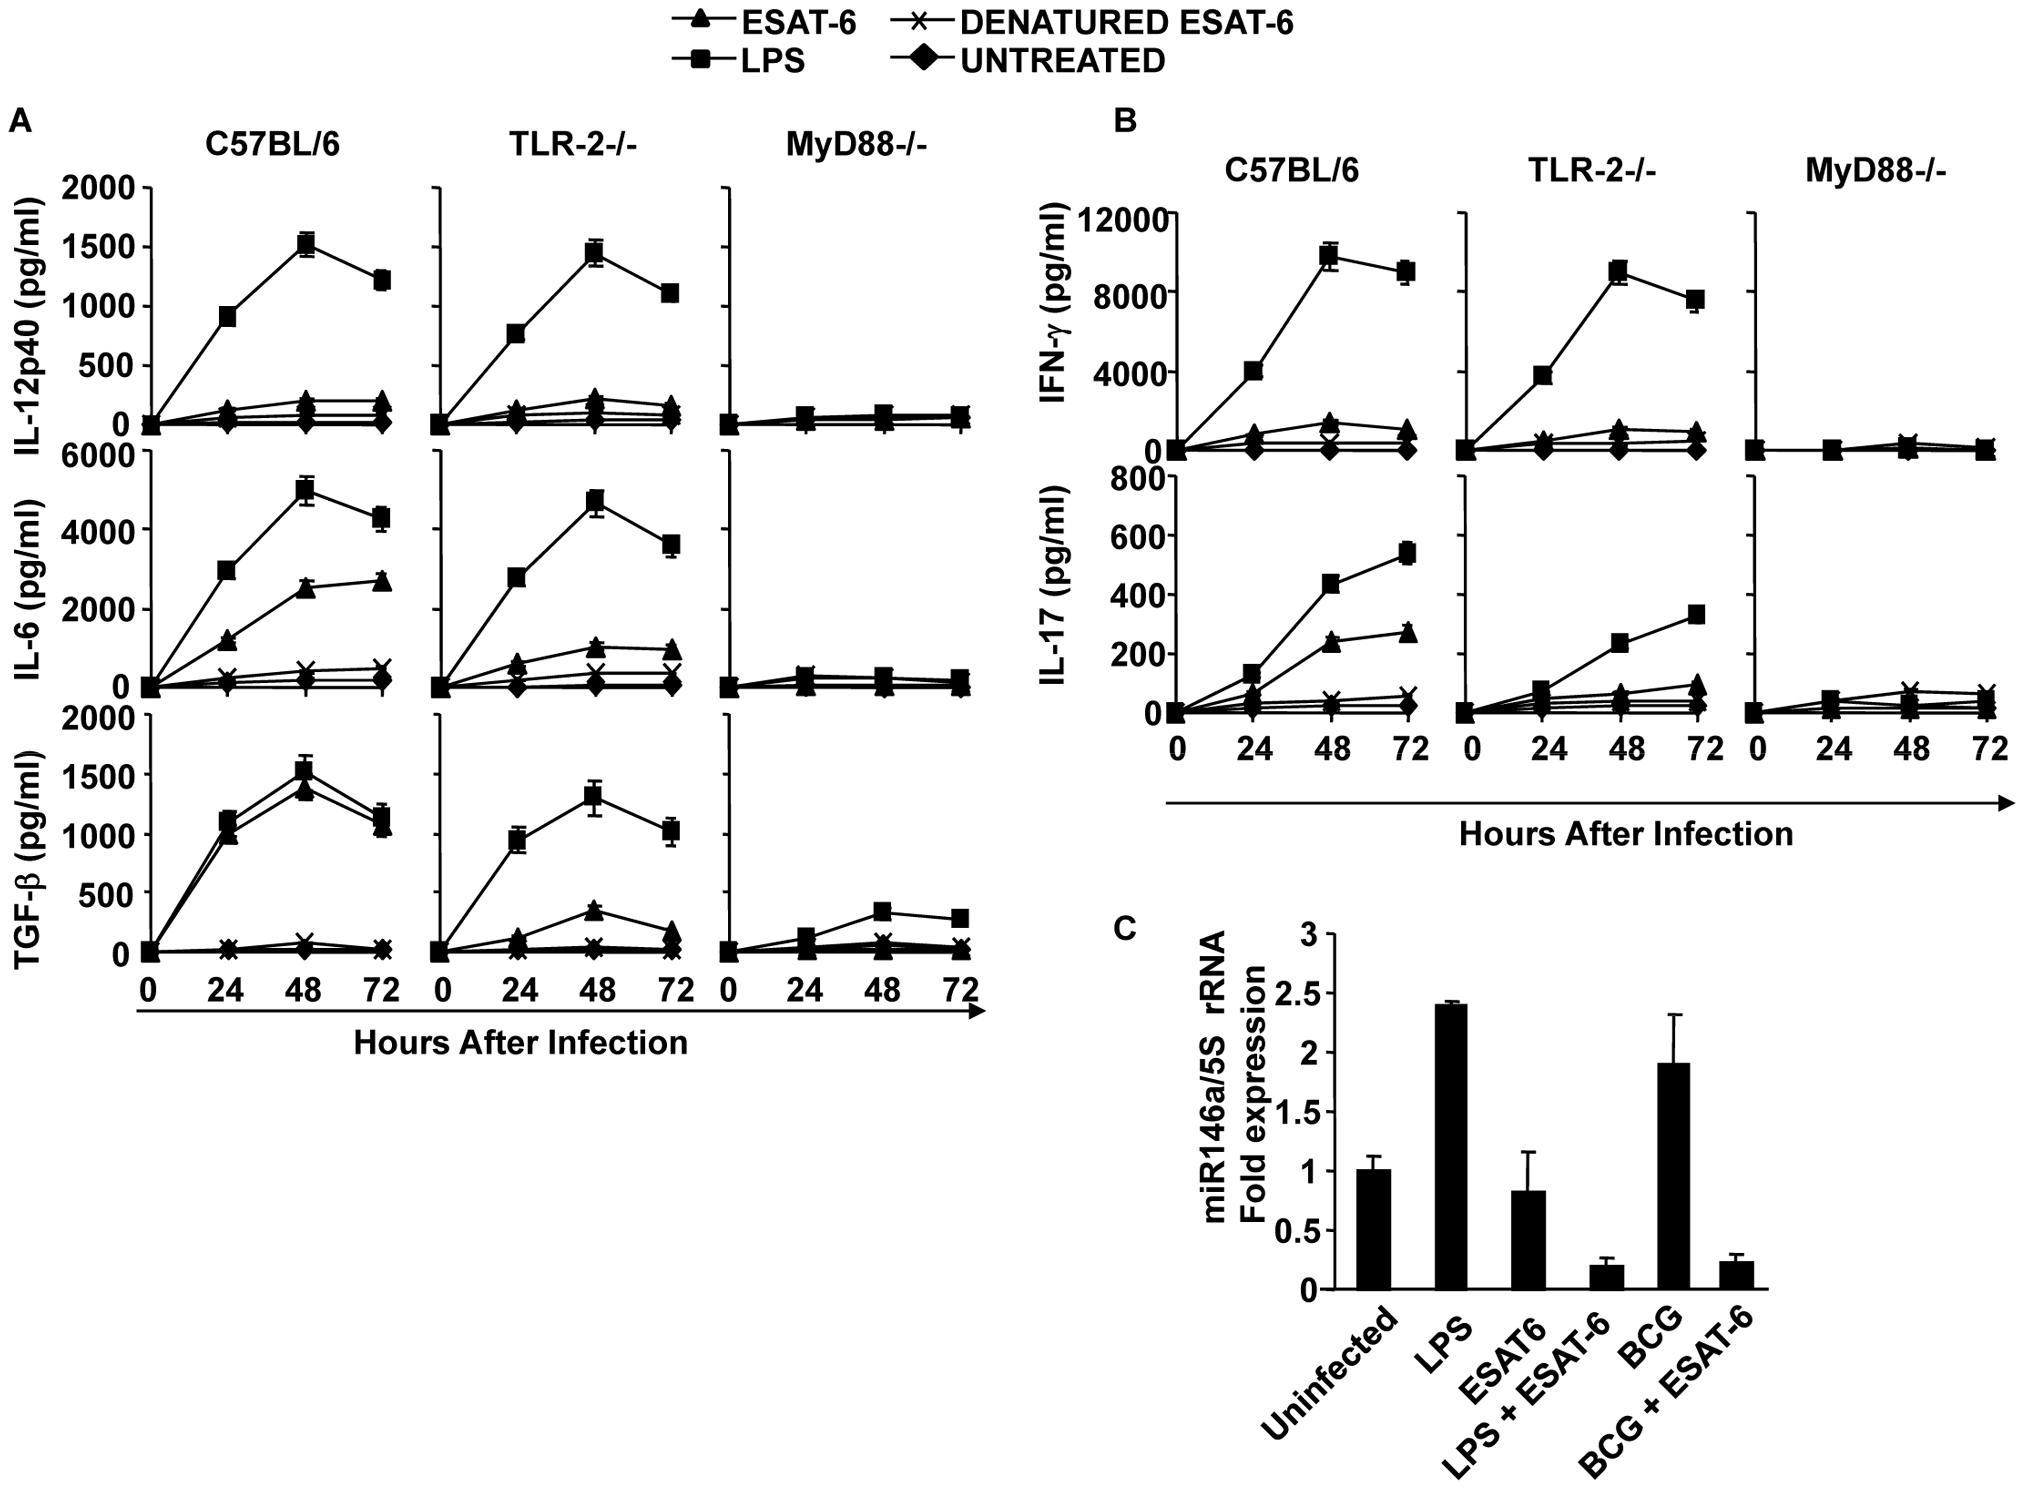 ESAT-6 induces IL-6 and TGF-β in DCs in a TLR-2- and MyD88-dependent manner.